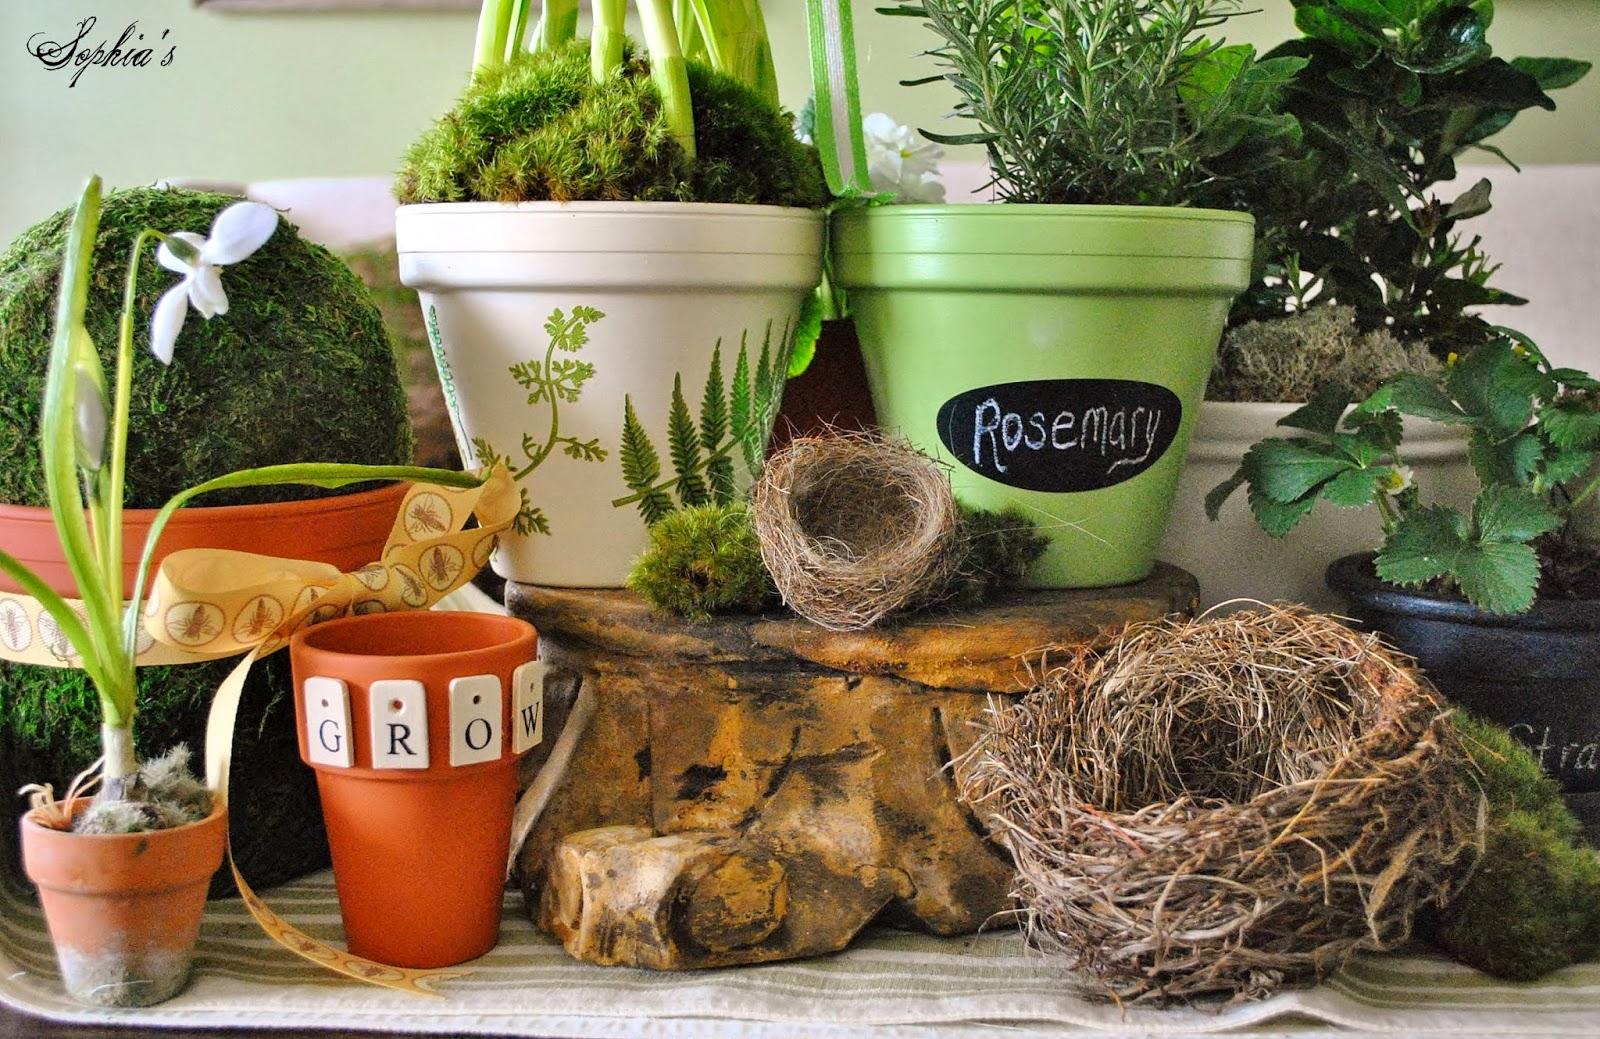 Sophia\'s: DIY Spring Clay Pots & Michaels Pinterest Party